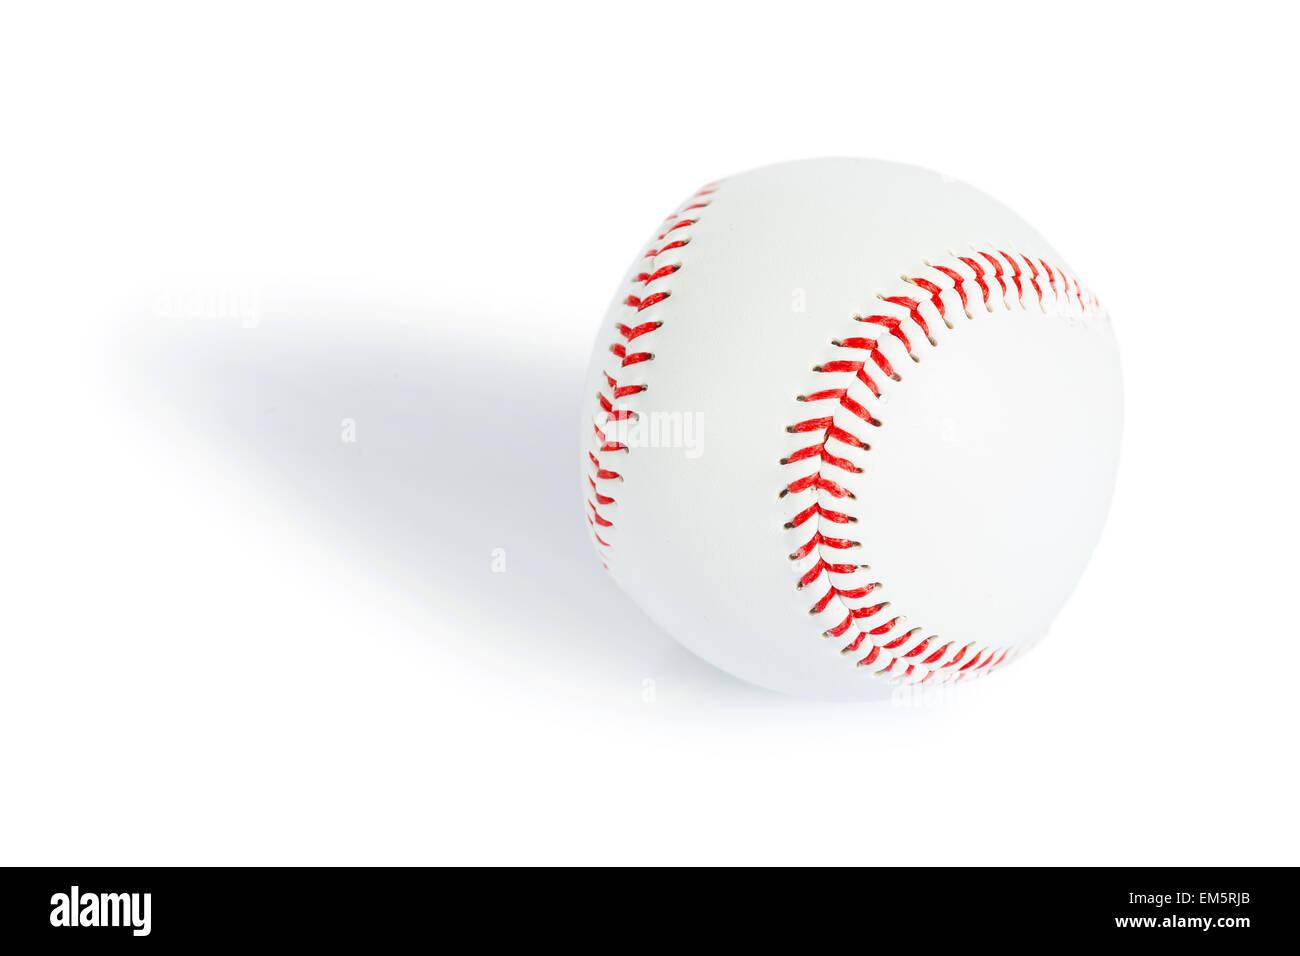 Ball Sports Symbols Stockfotos & Ball Sports Symbols Bilder - Alamy